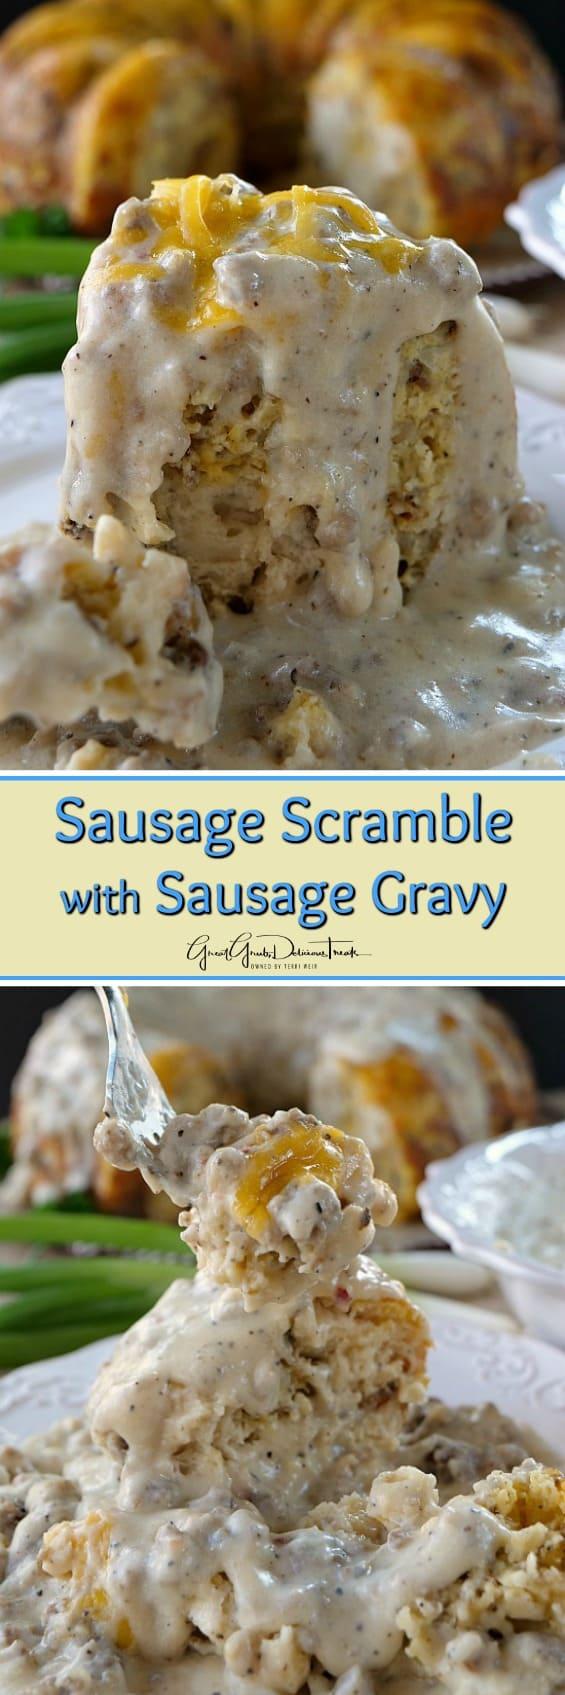 Sausage Scramble with Sausage Gravy